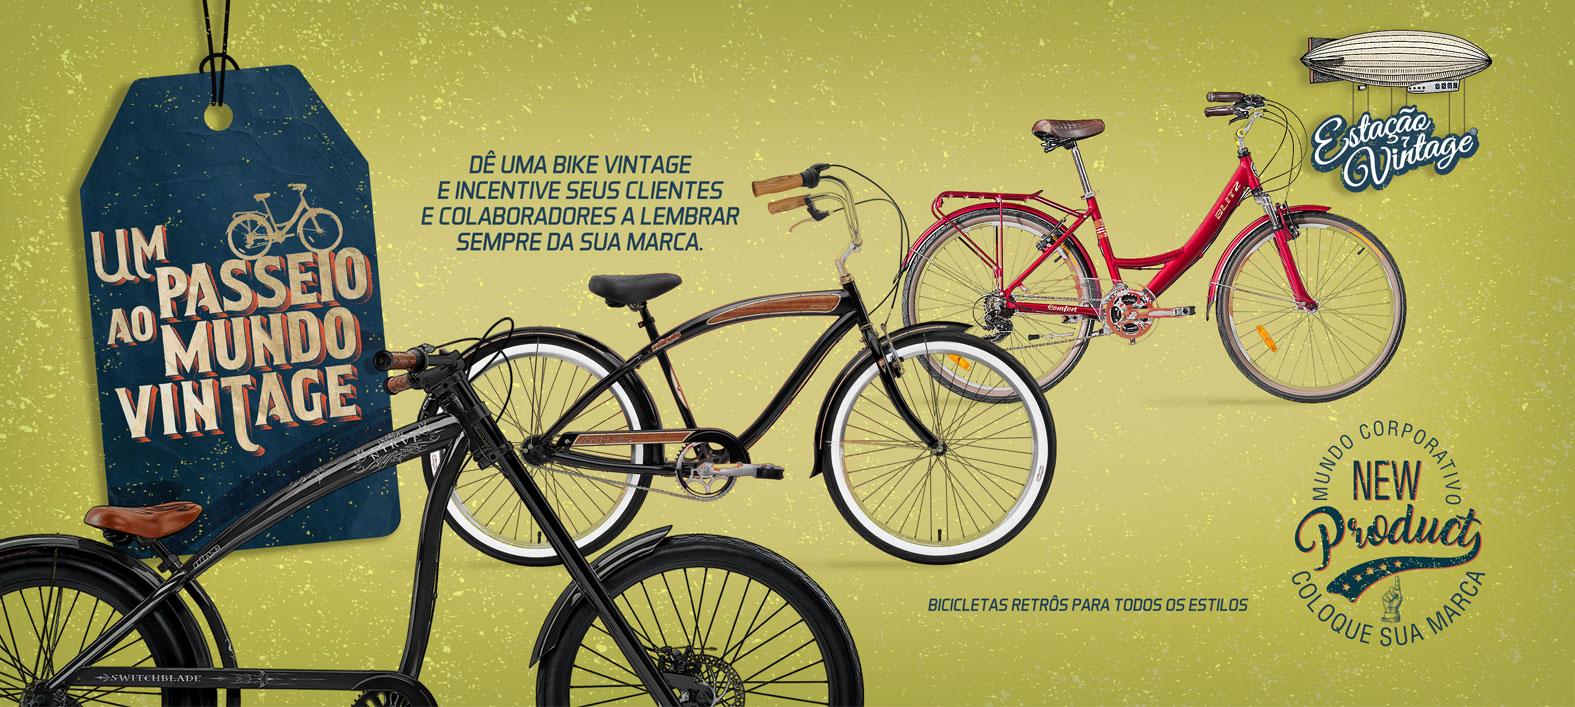 Bike - Passeio ao Mundo Vintage